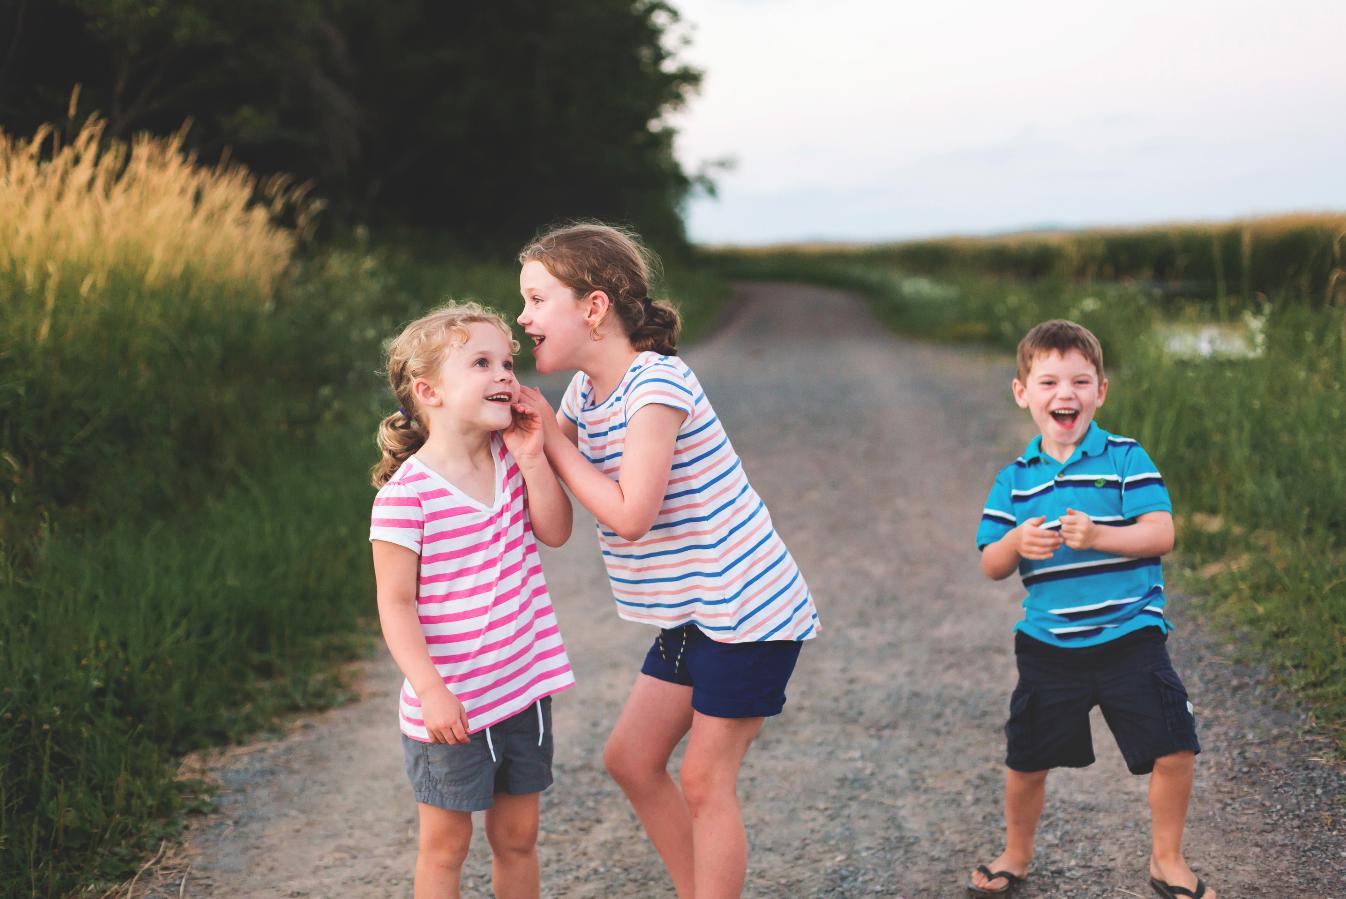 Hamilton-Toronto-Burlington-Oakville-welland-Niagara-Cambridge-Dundas-Ontario-Family-photographer-photography-Moments-by-Lauren-Nova-Scotia-Antigonish-Lifestyle-Session-Image-Photo-22.png